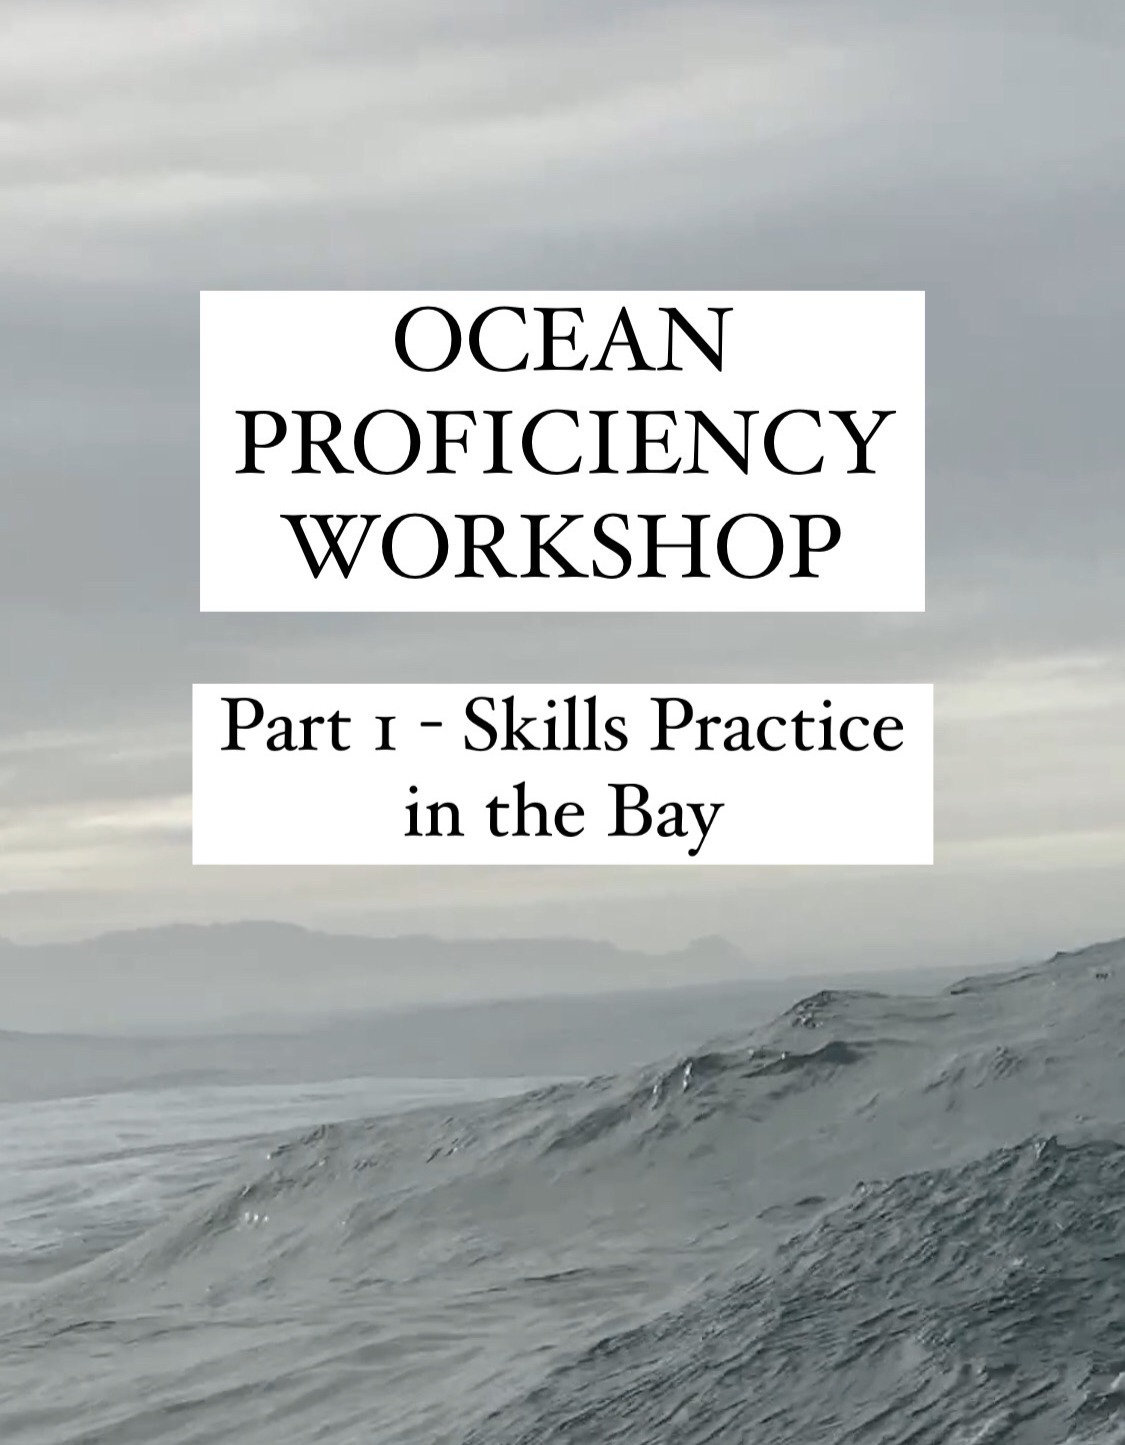 North Coast Ocean Proficiency Workshop 1